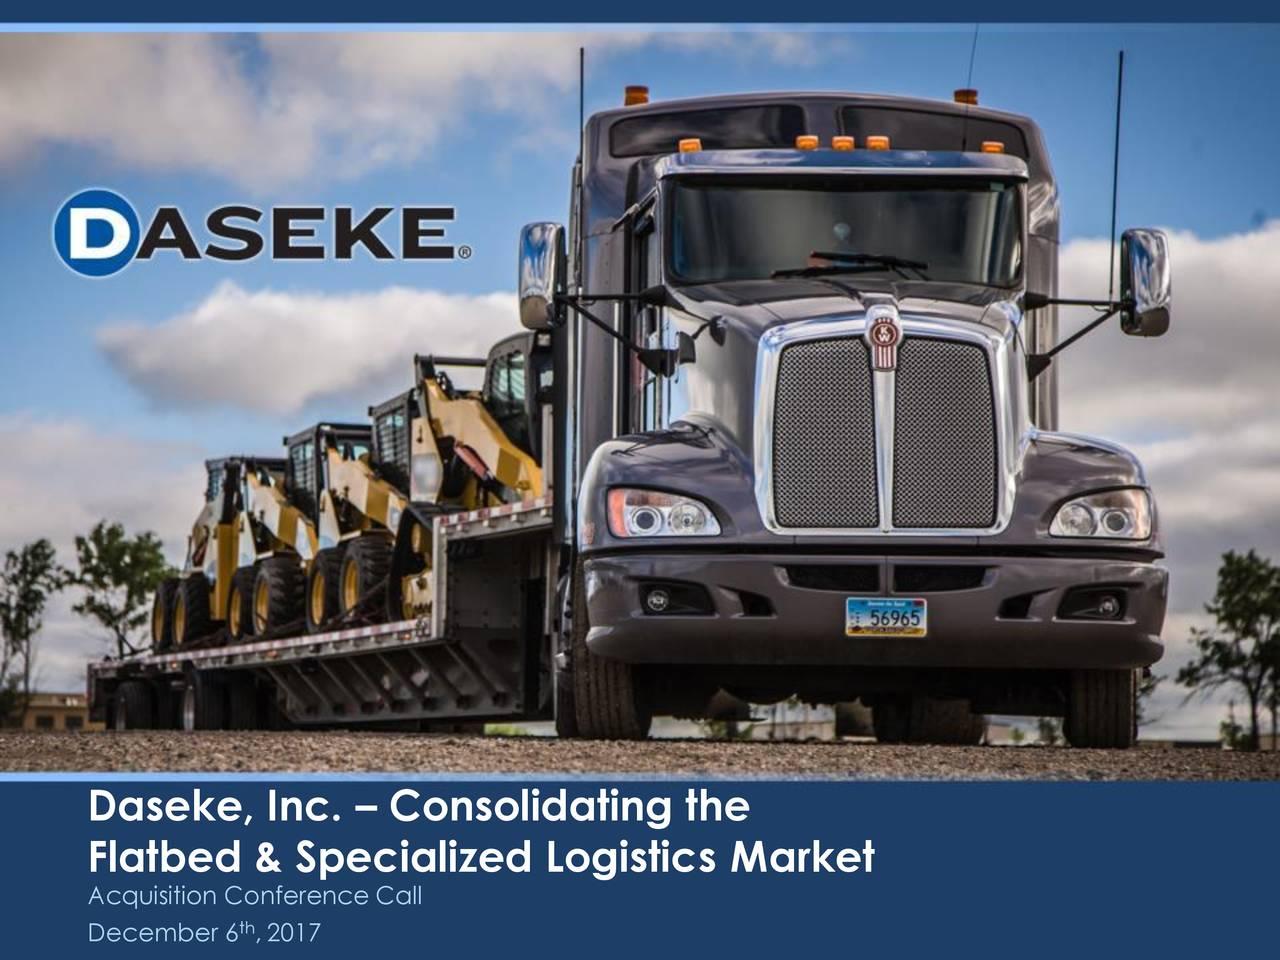 Daseke, Inc. – Consolidating the